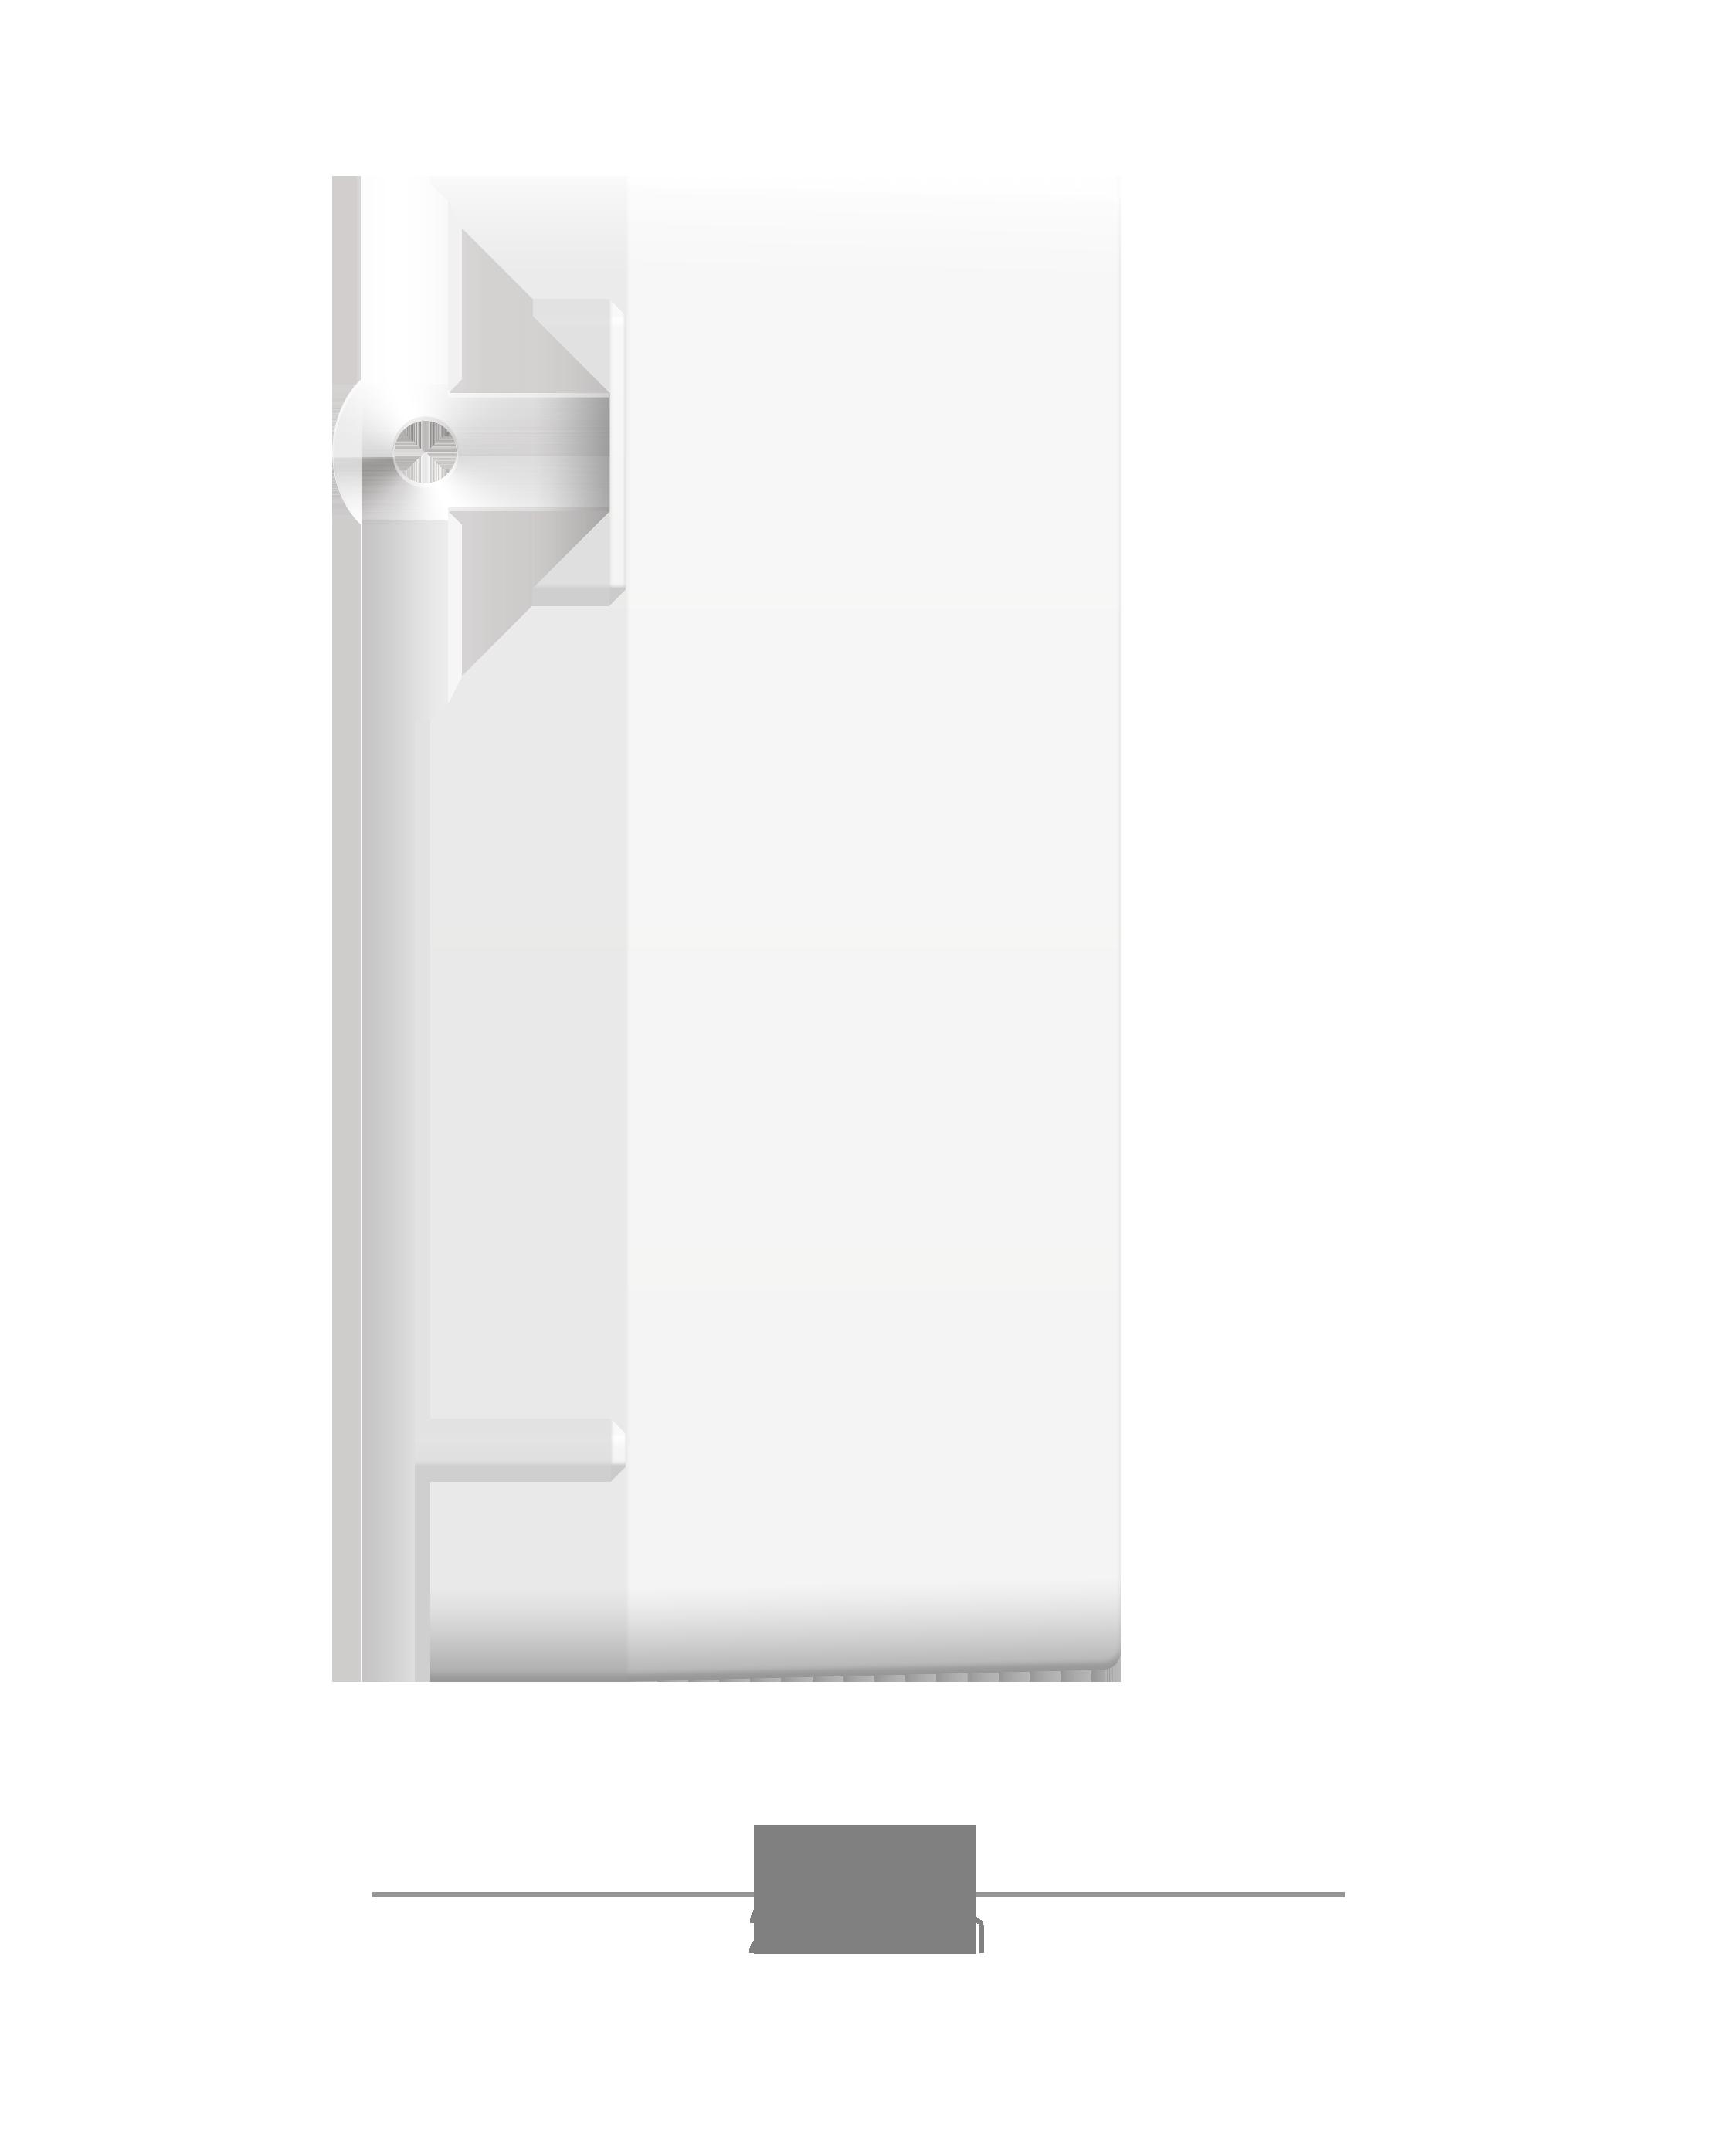 dimensions-left.png